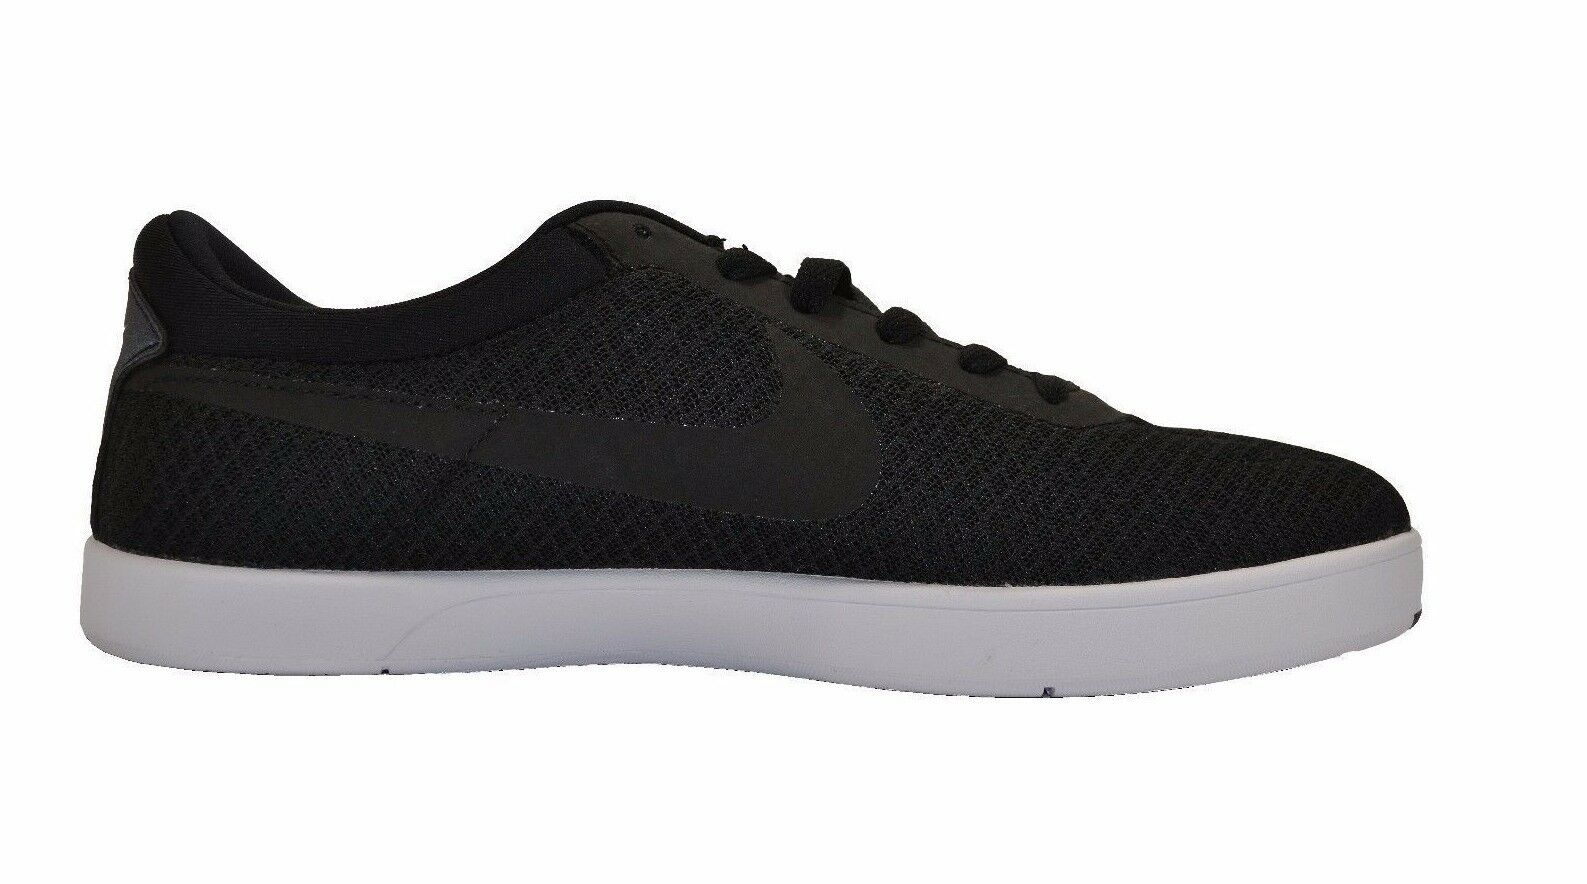 Nike ERIC KOSTON FR Black White Skateboarding Discounted (291) Men's Shoes